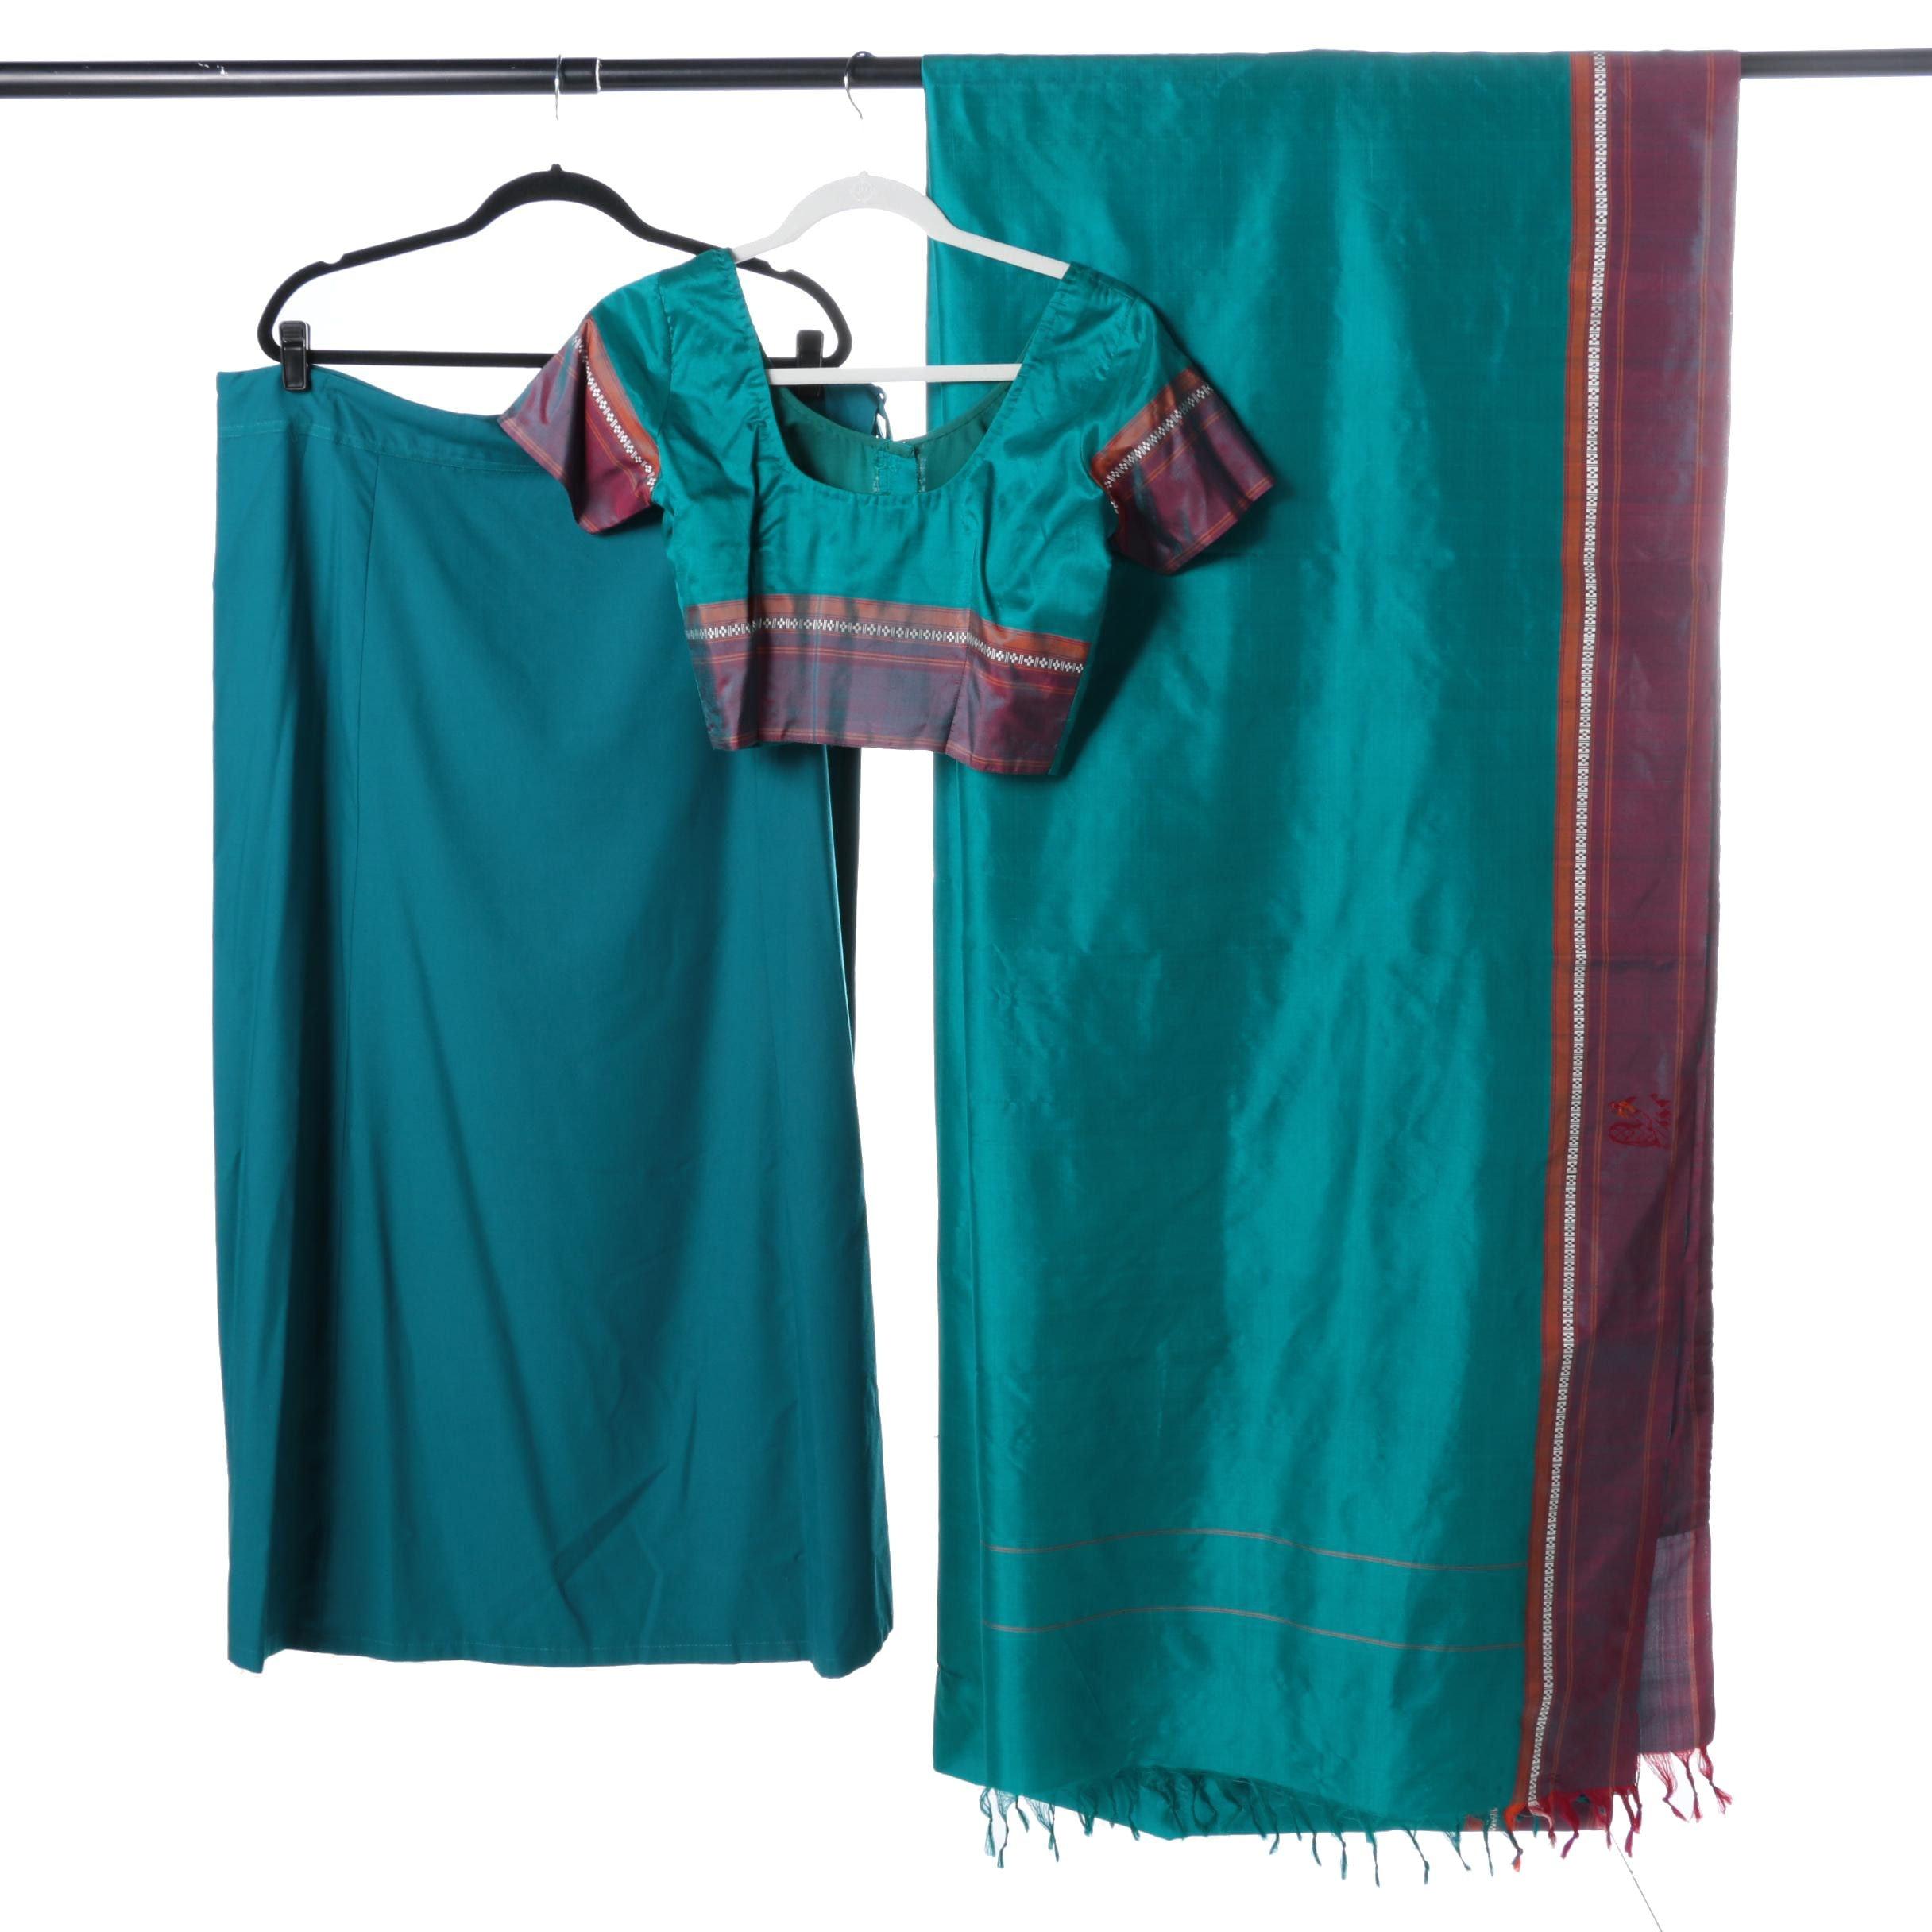 Women's Teal Striped Sari